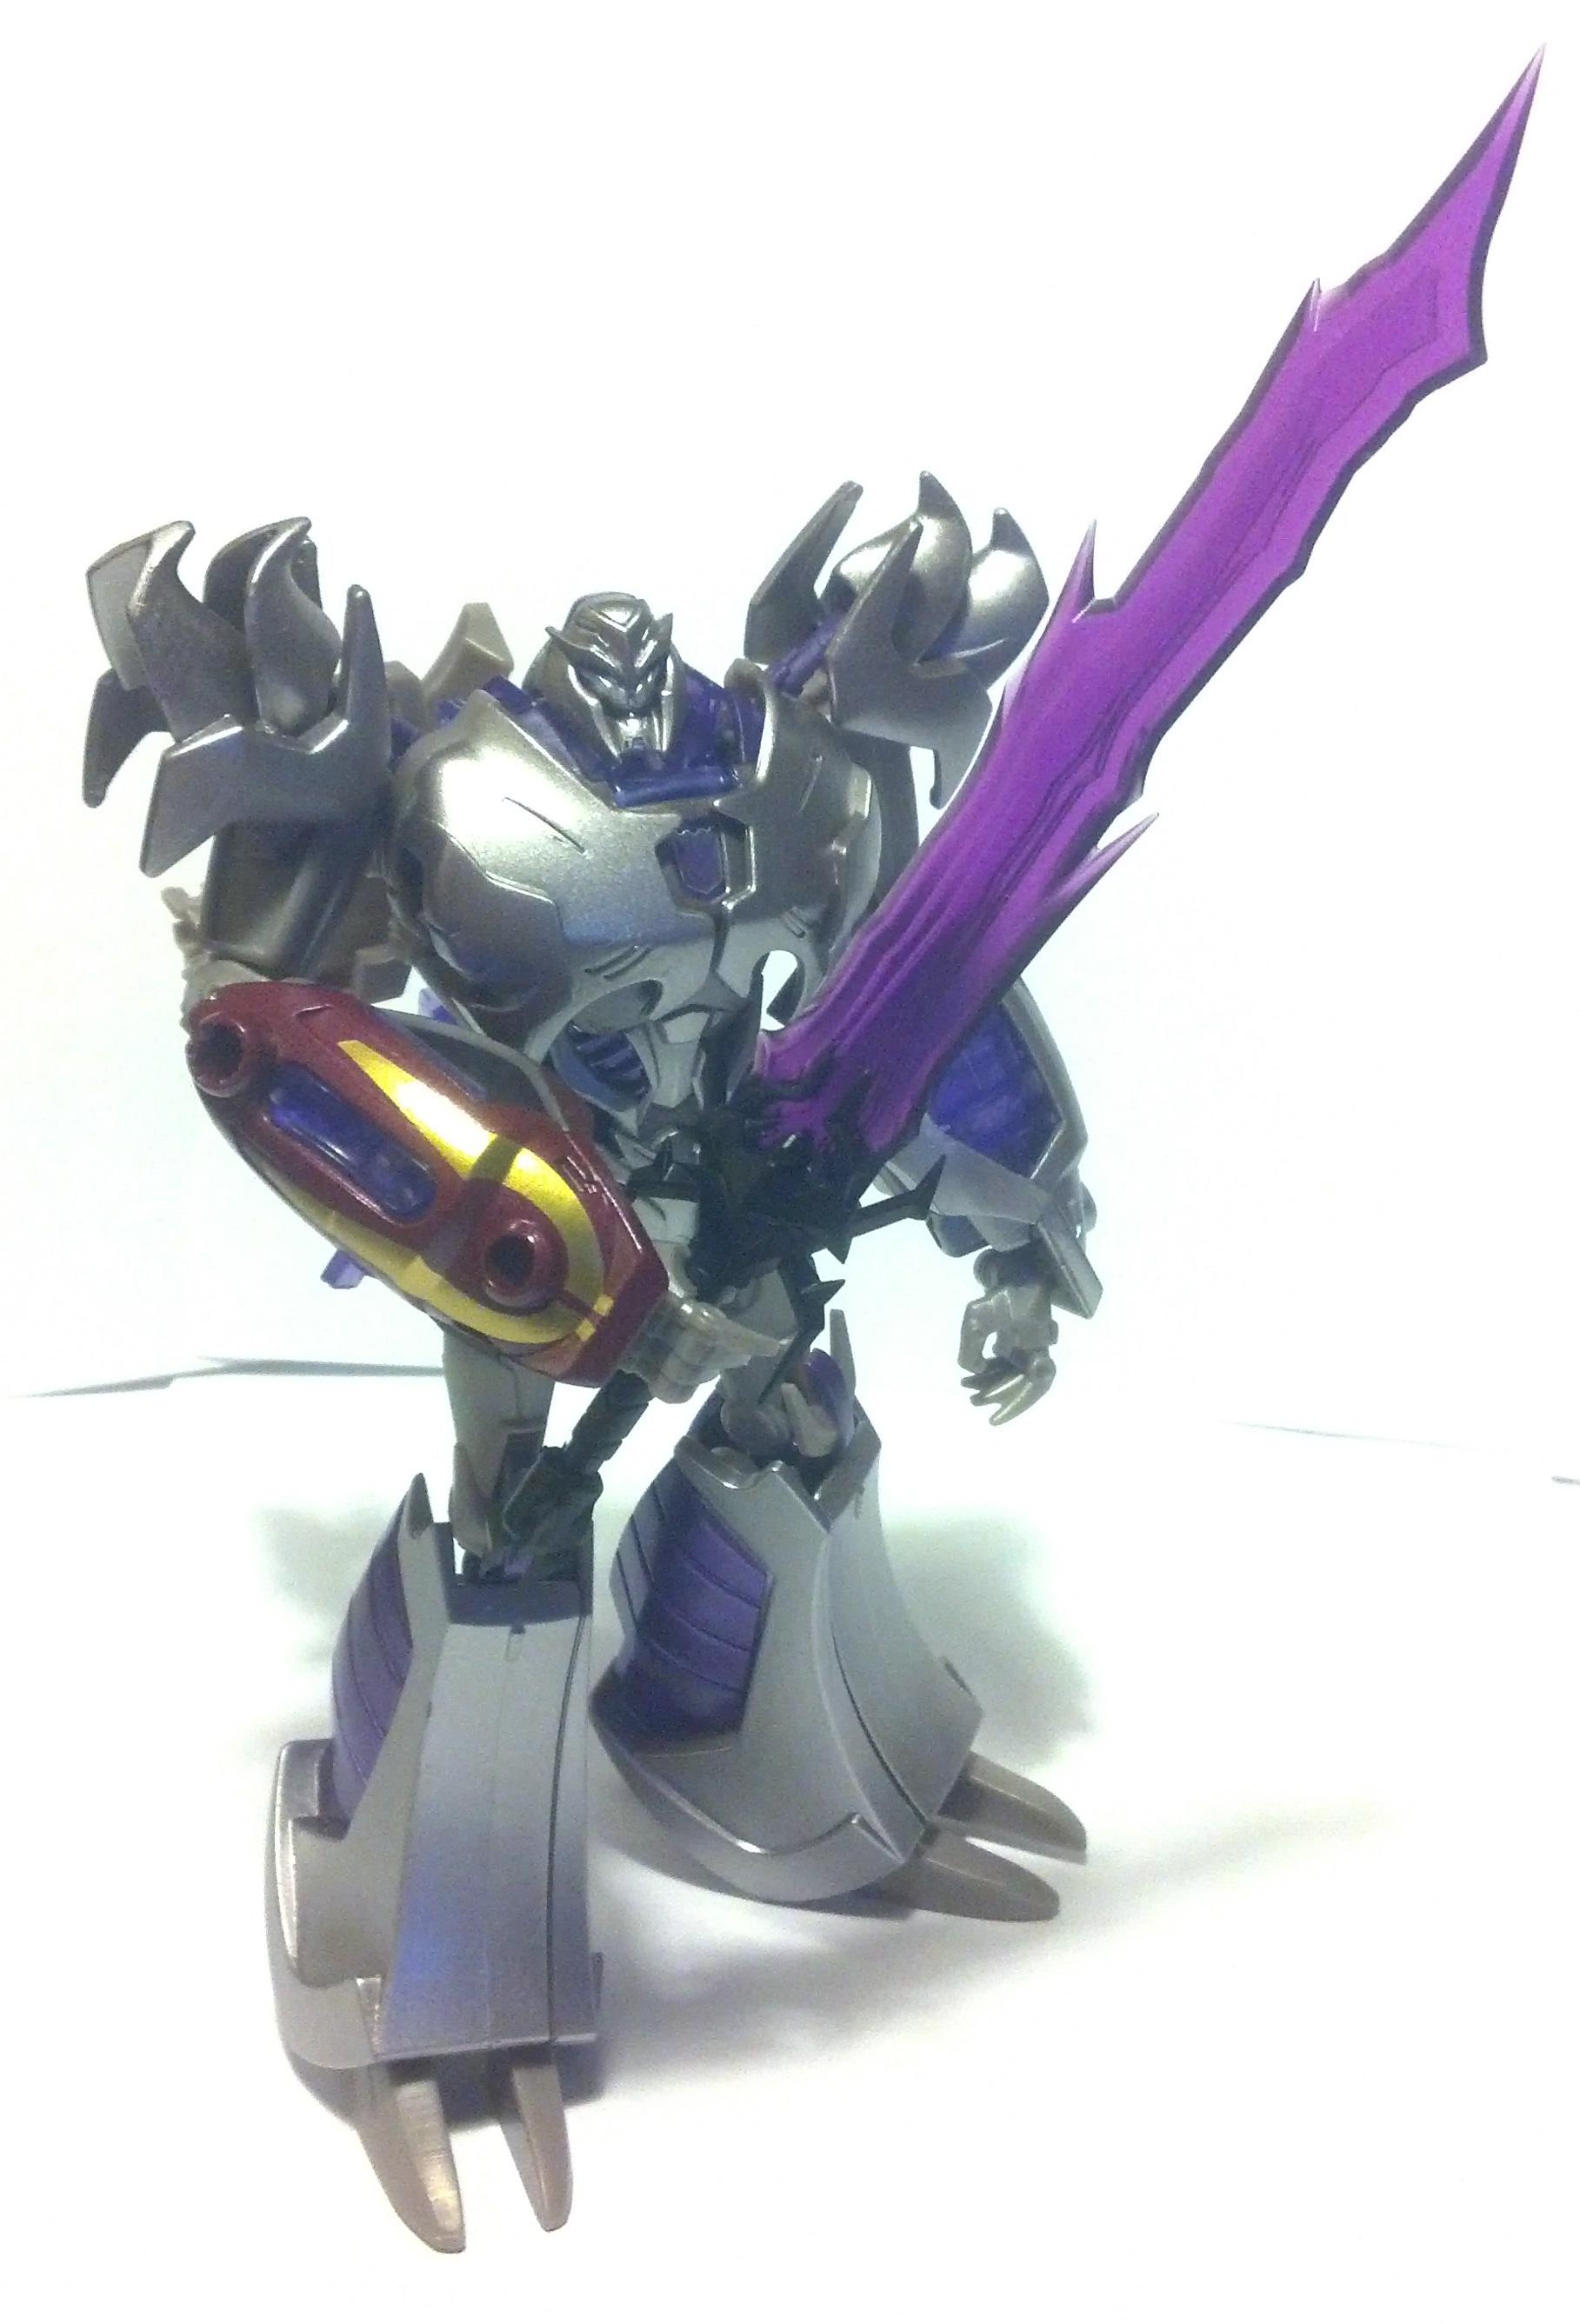 Dr. Wu's TP-08 Sky Breaker Sword, TP-09 Tyrant Sword and Prime's alt head | TransformersToyReviews